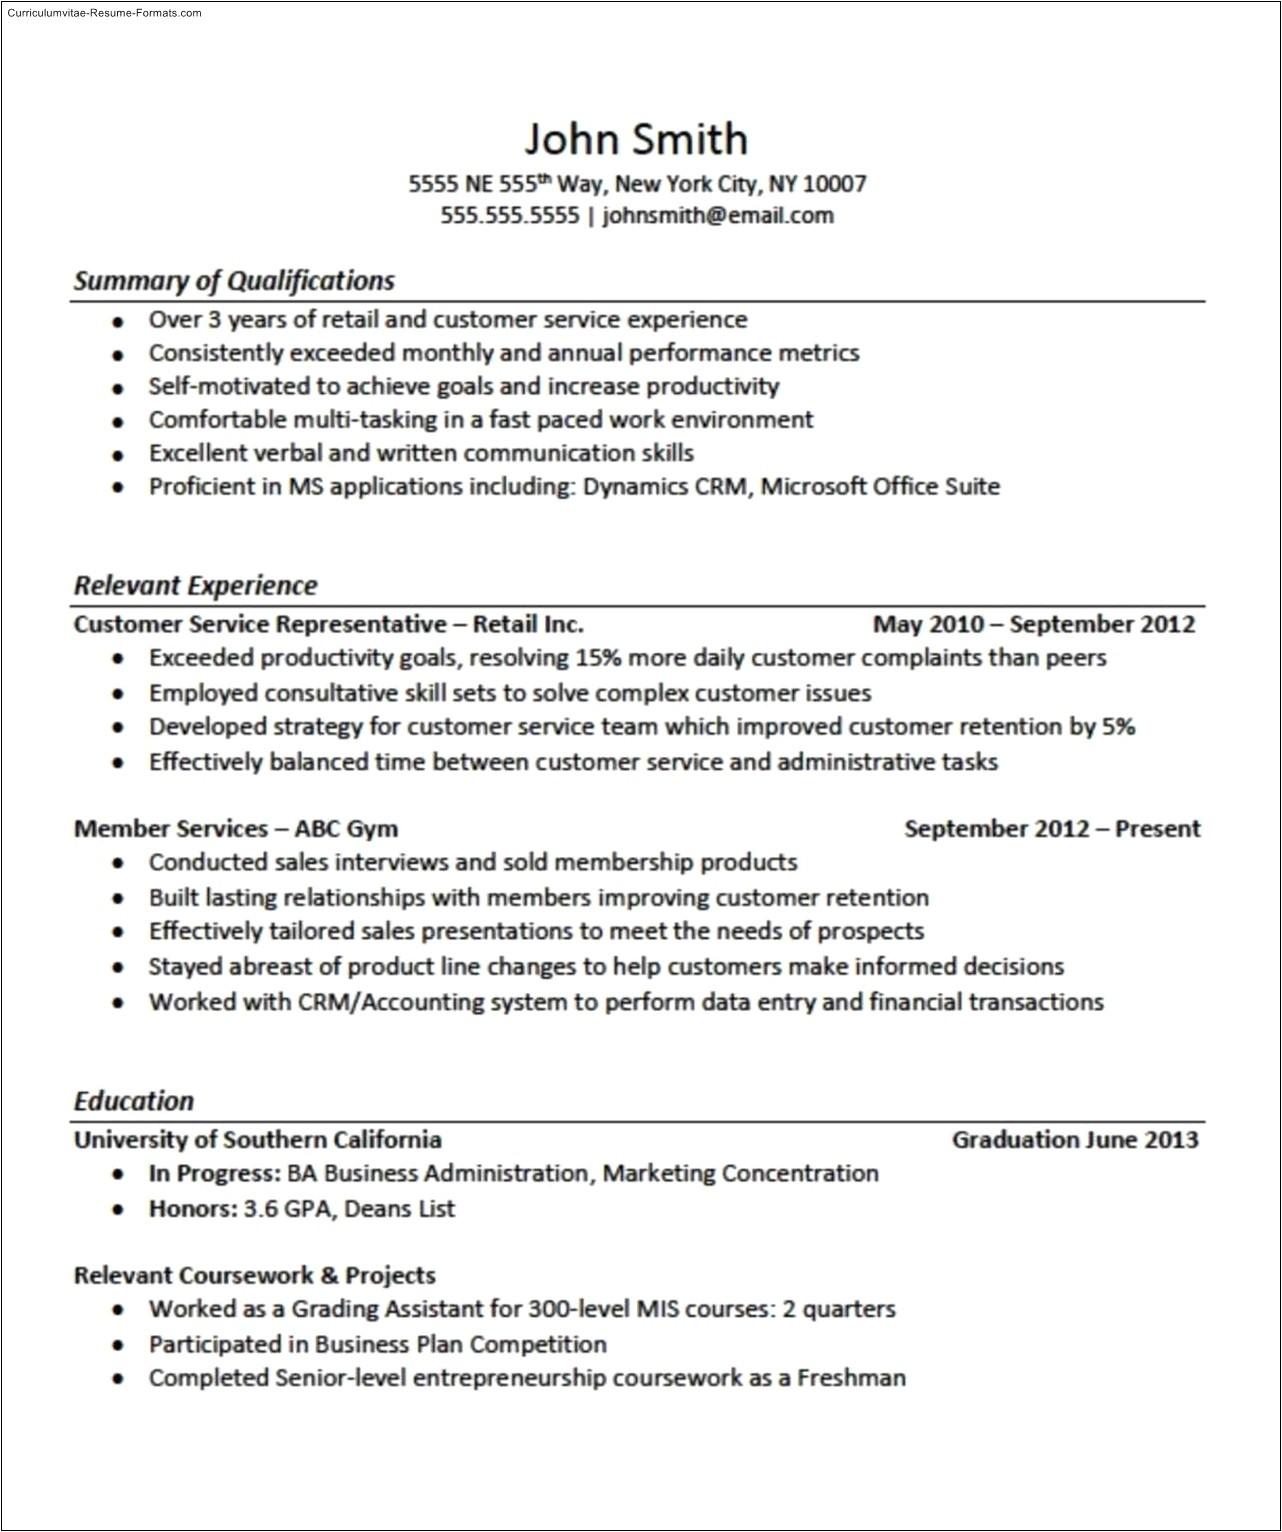 Professional Resume Word Template 14 Elegant Professional Resume Templates Word Resume